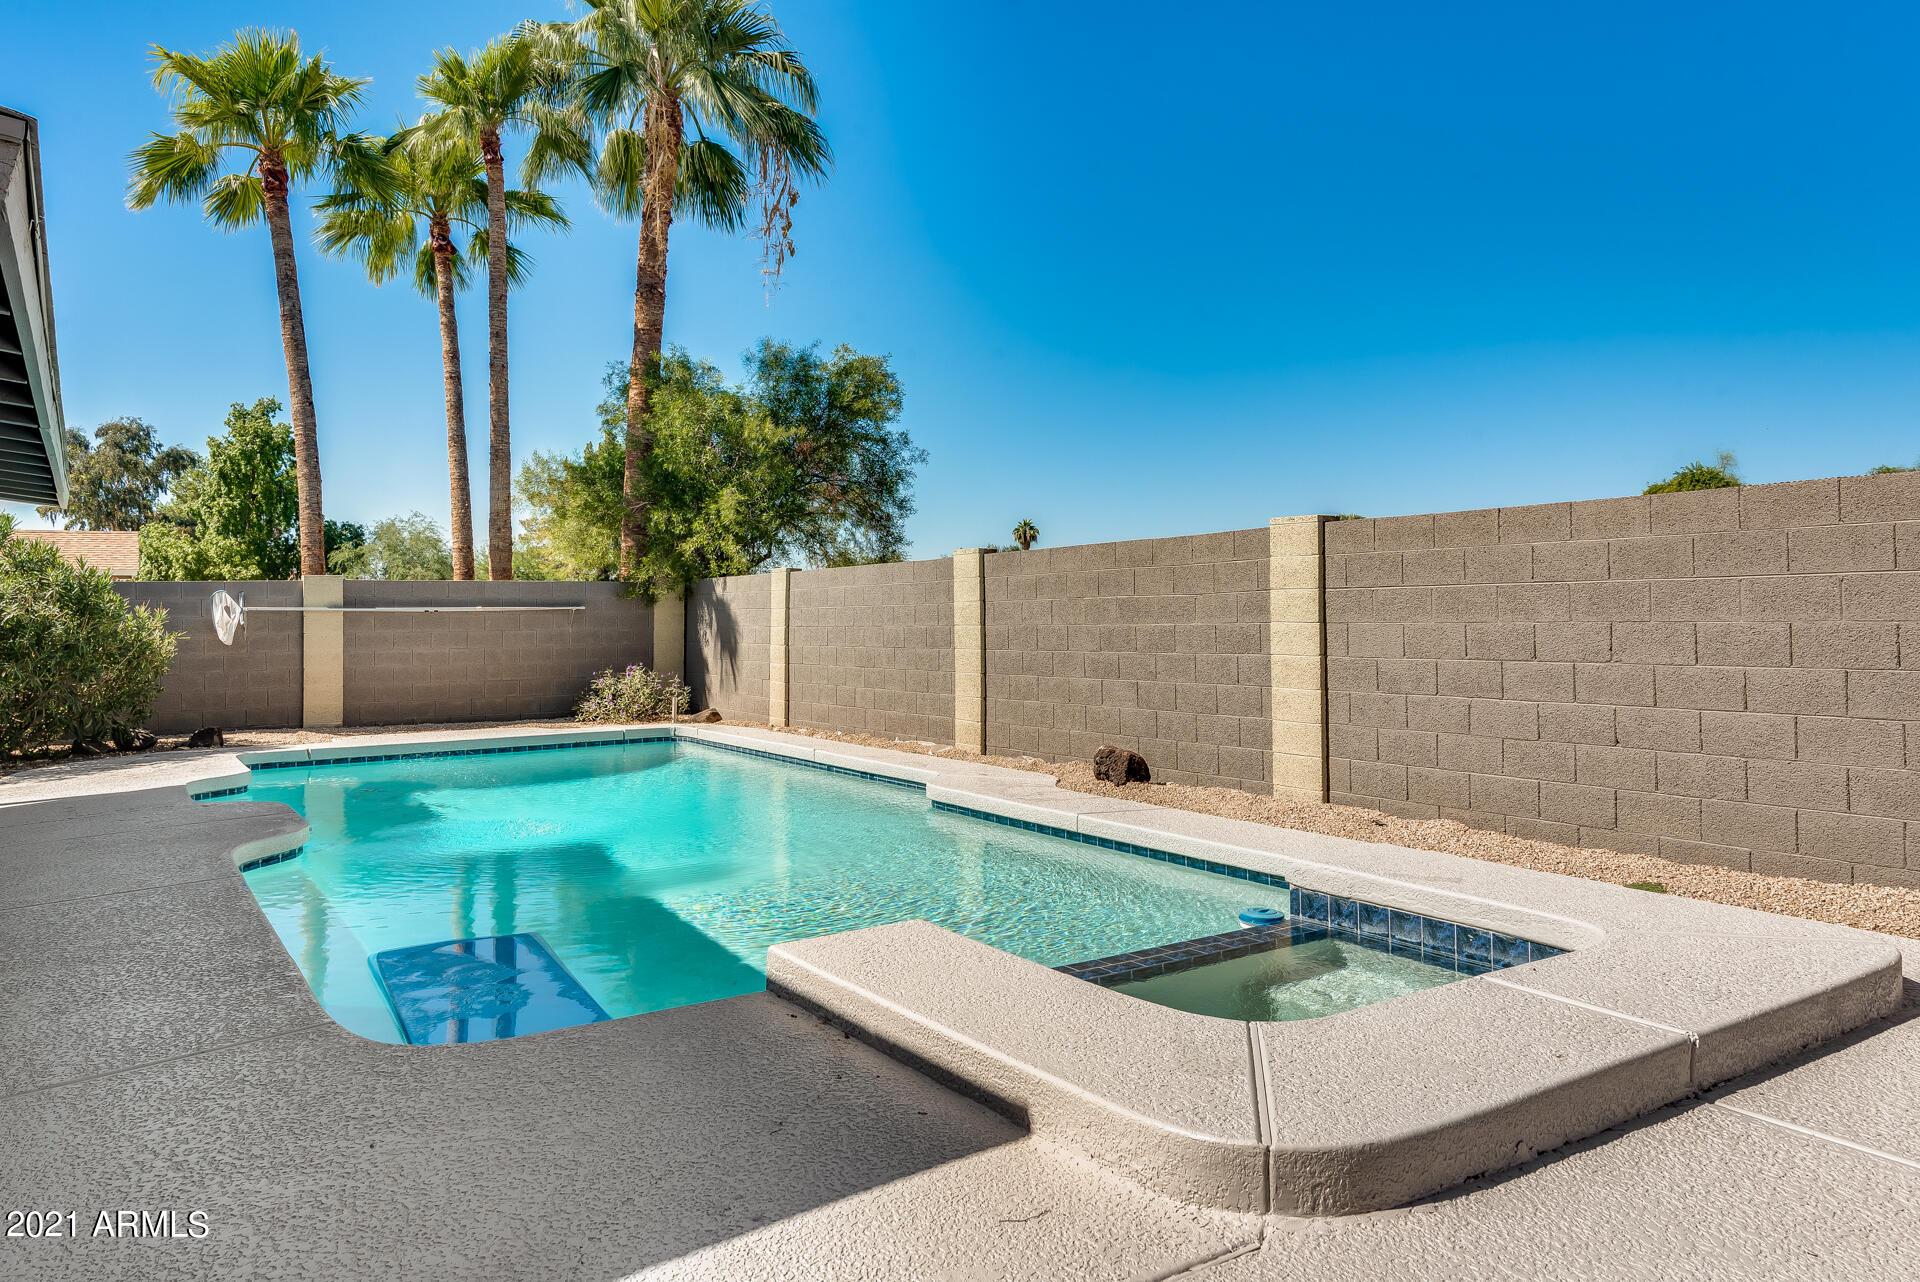 MLS 6294124 4630 W AIRE LIBRE Avenue, Glendale, AZ 85306 Glendale AZ North Glendale